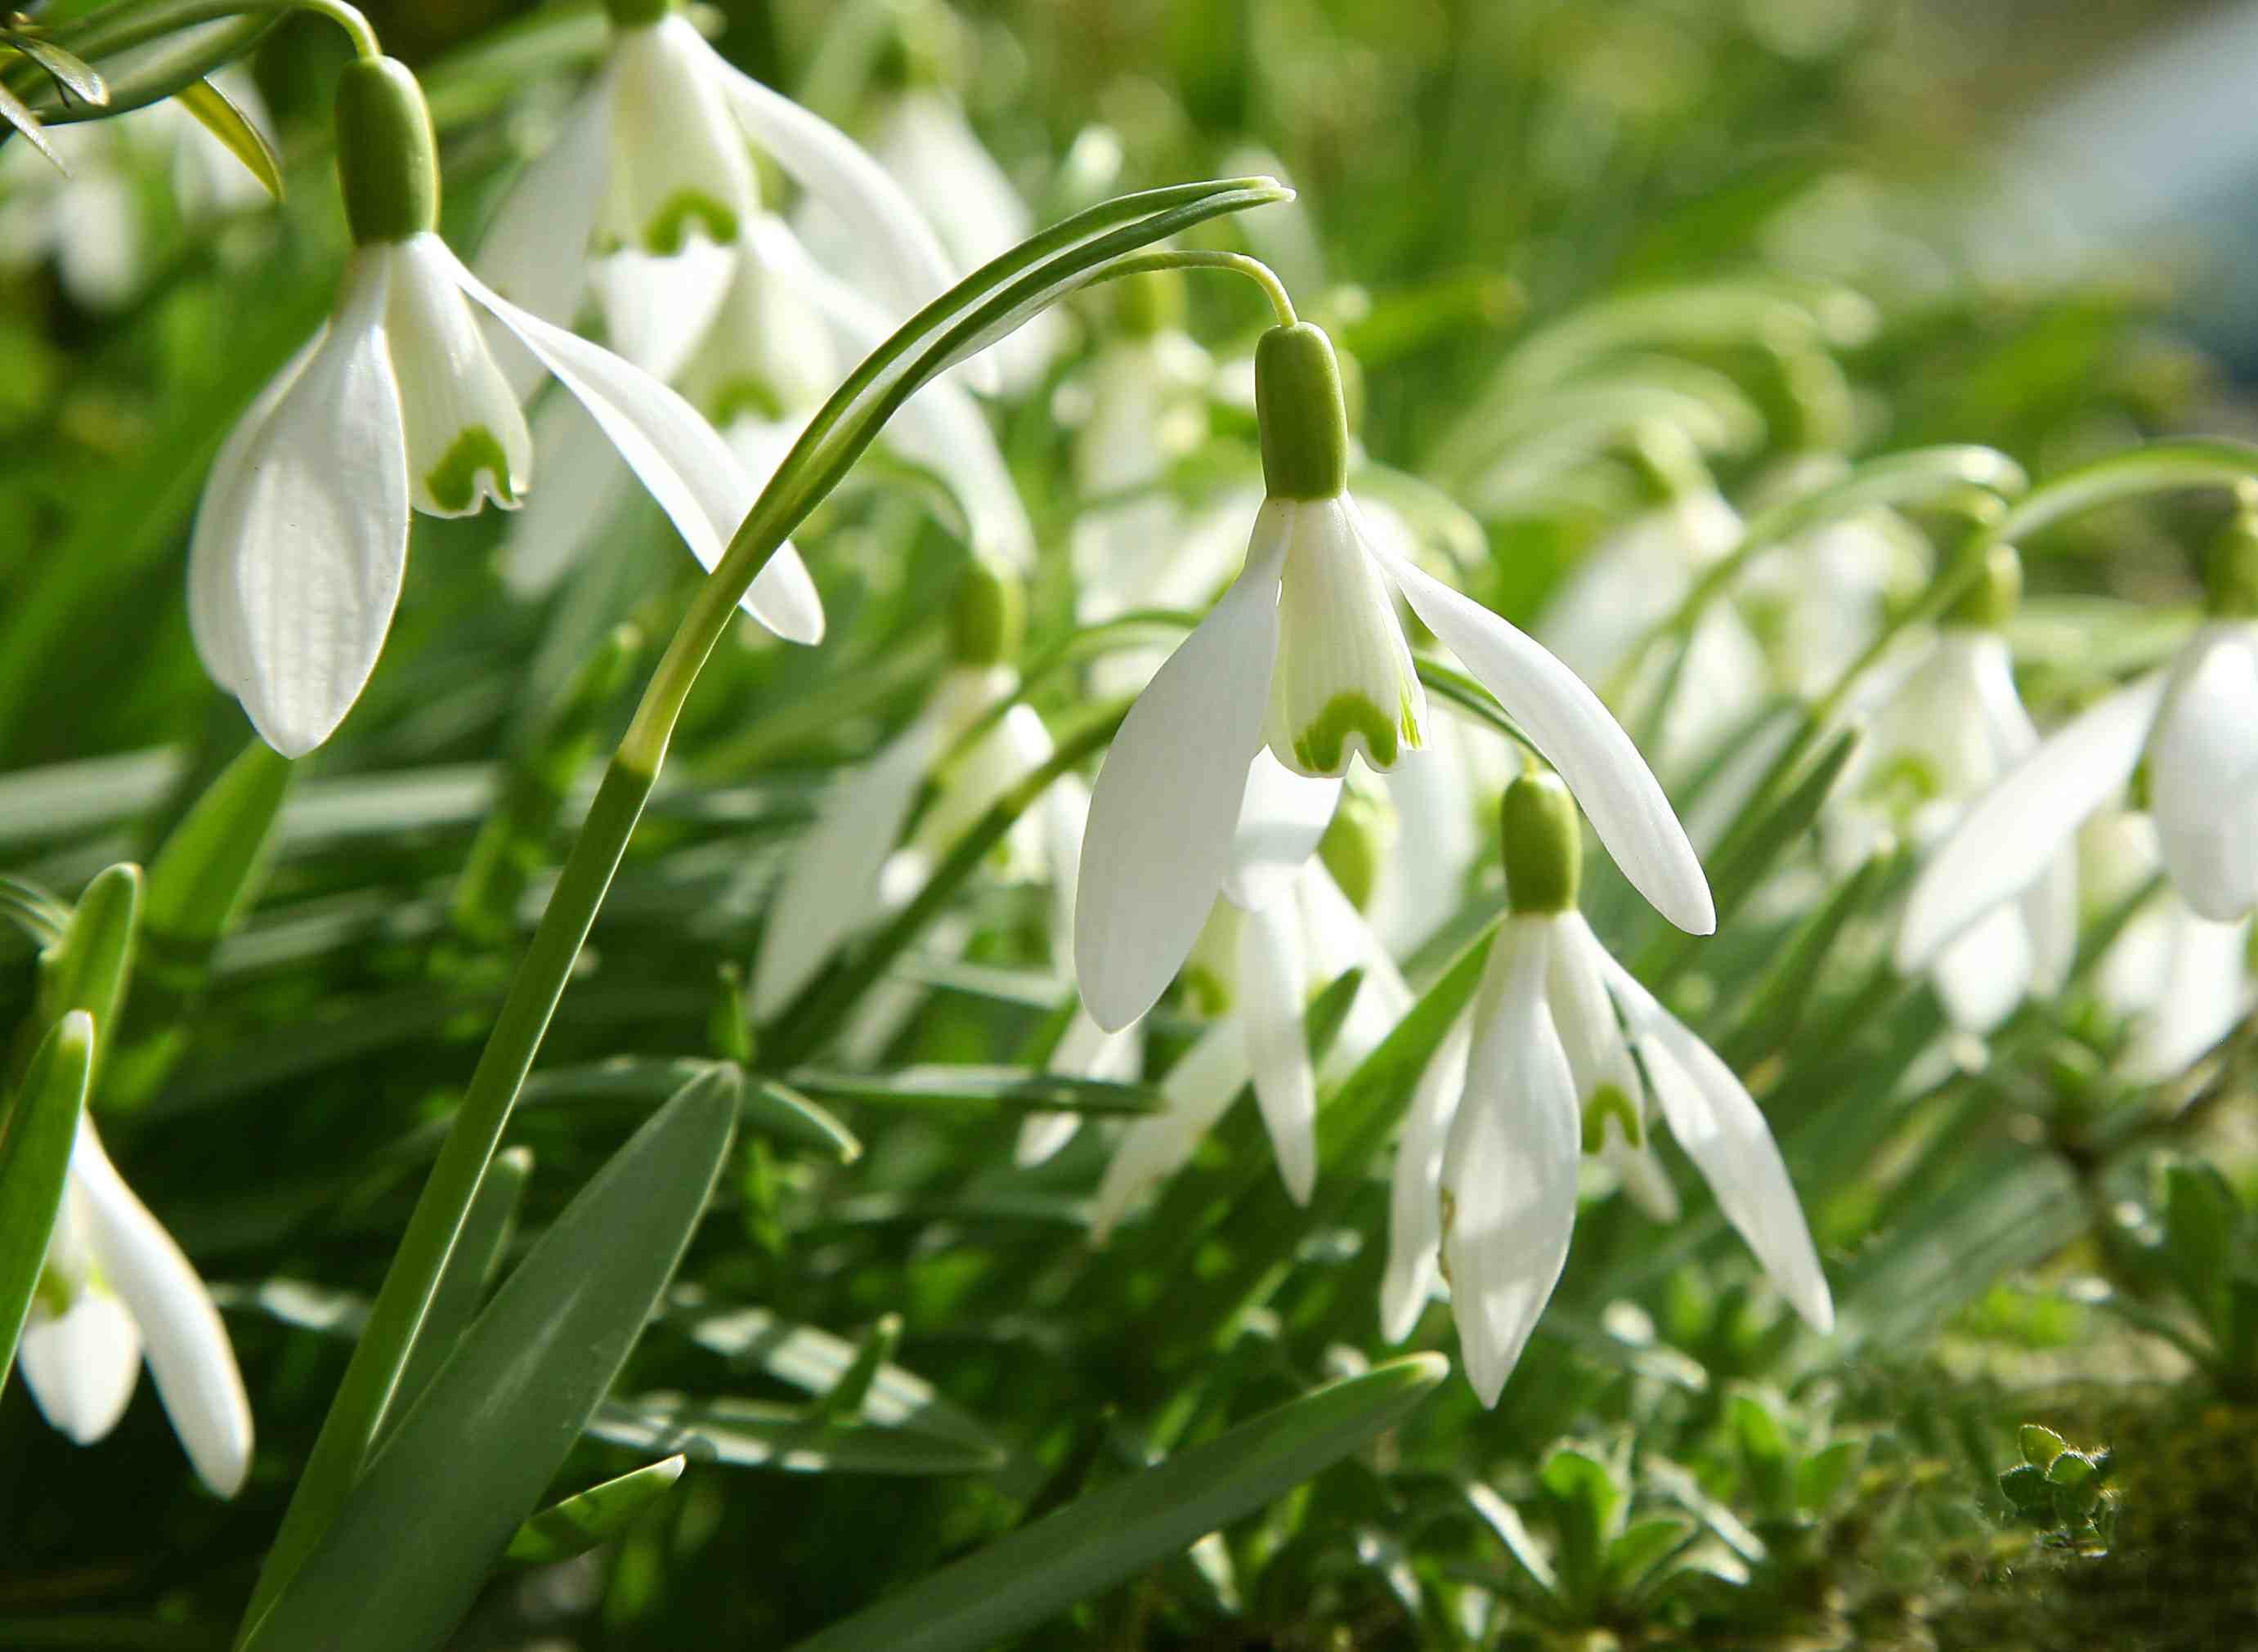 Snowdrop flowers (Galanthus)